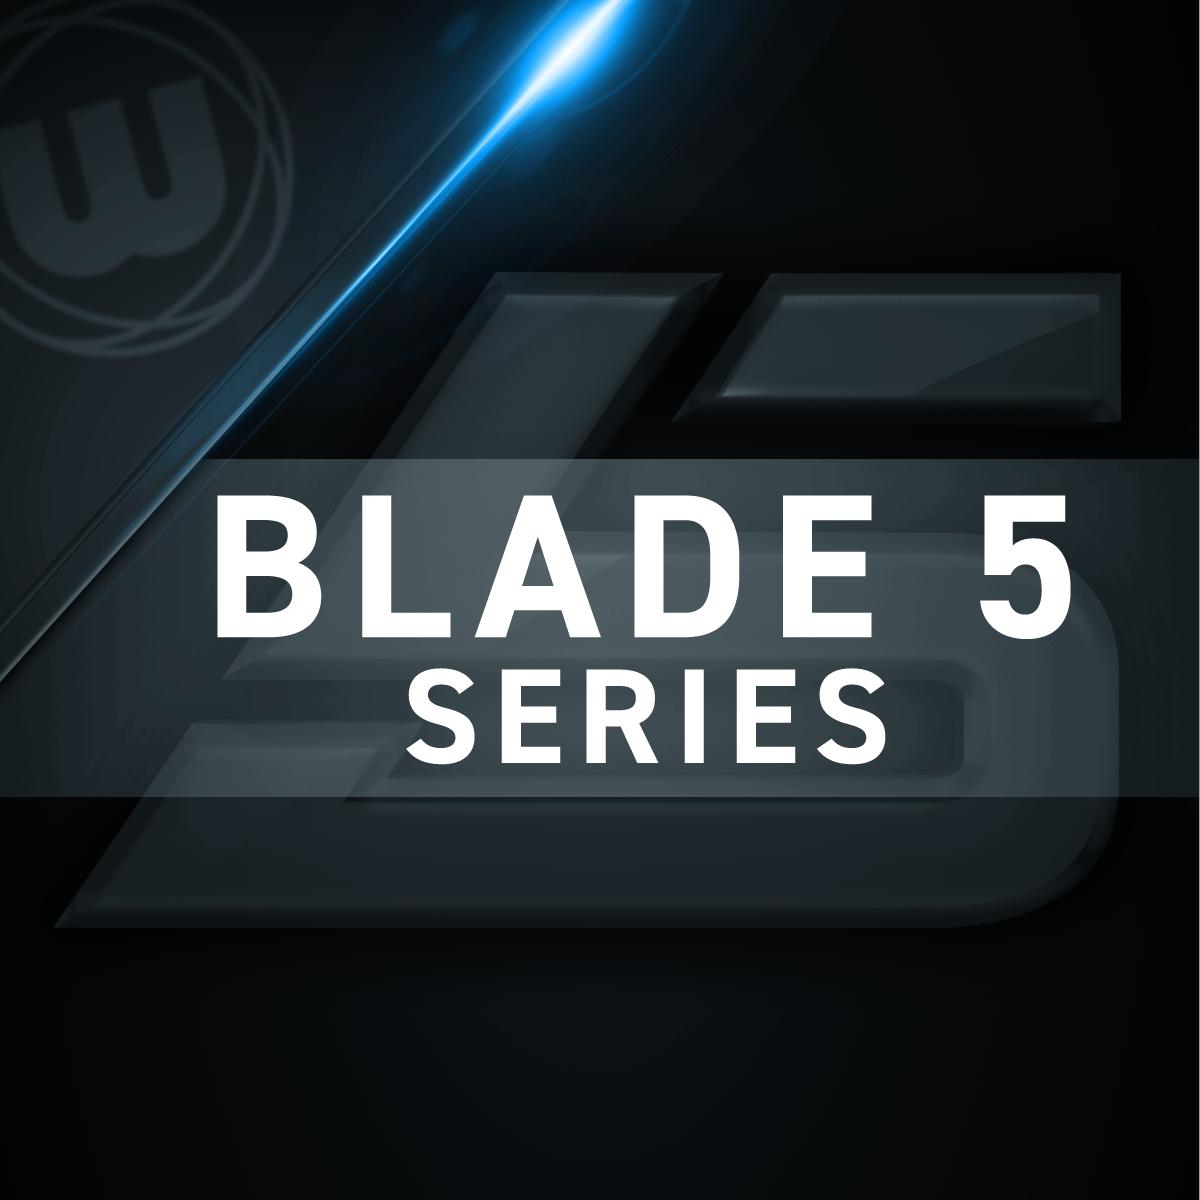 Blade 5 Series